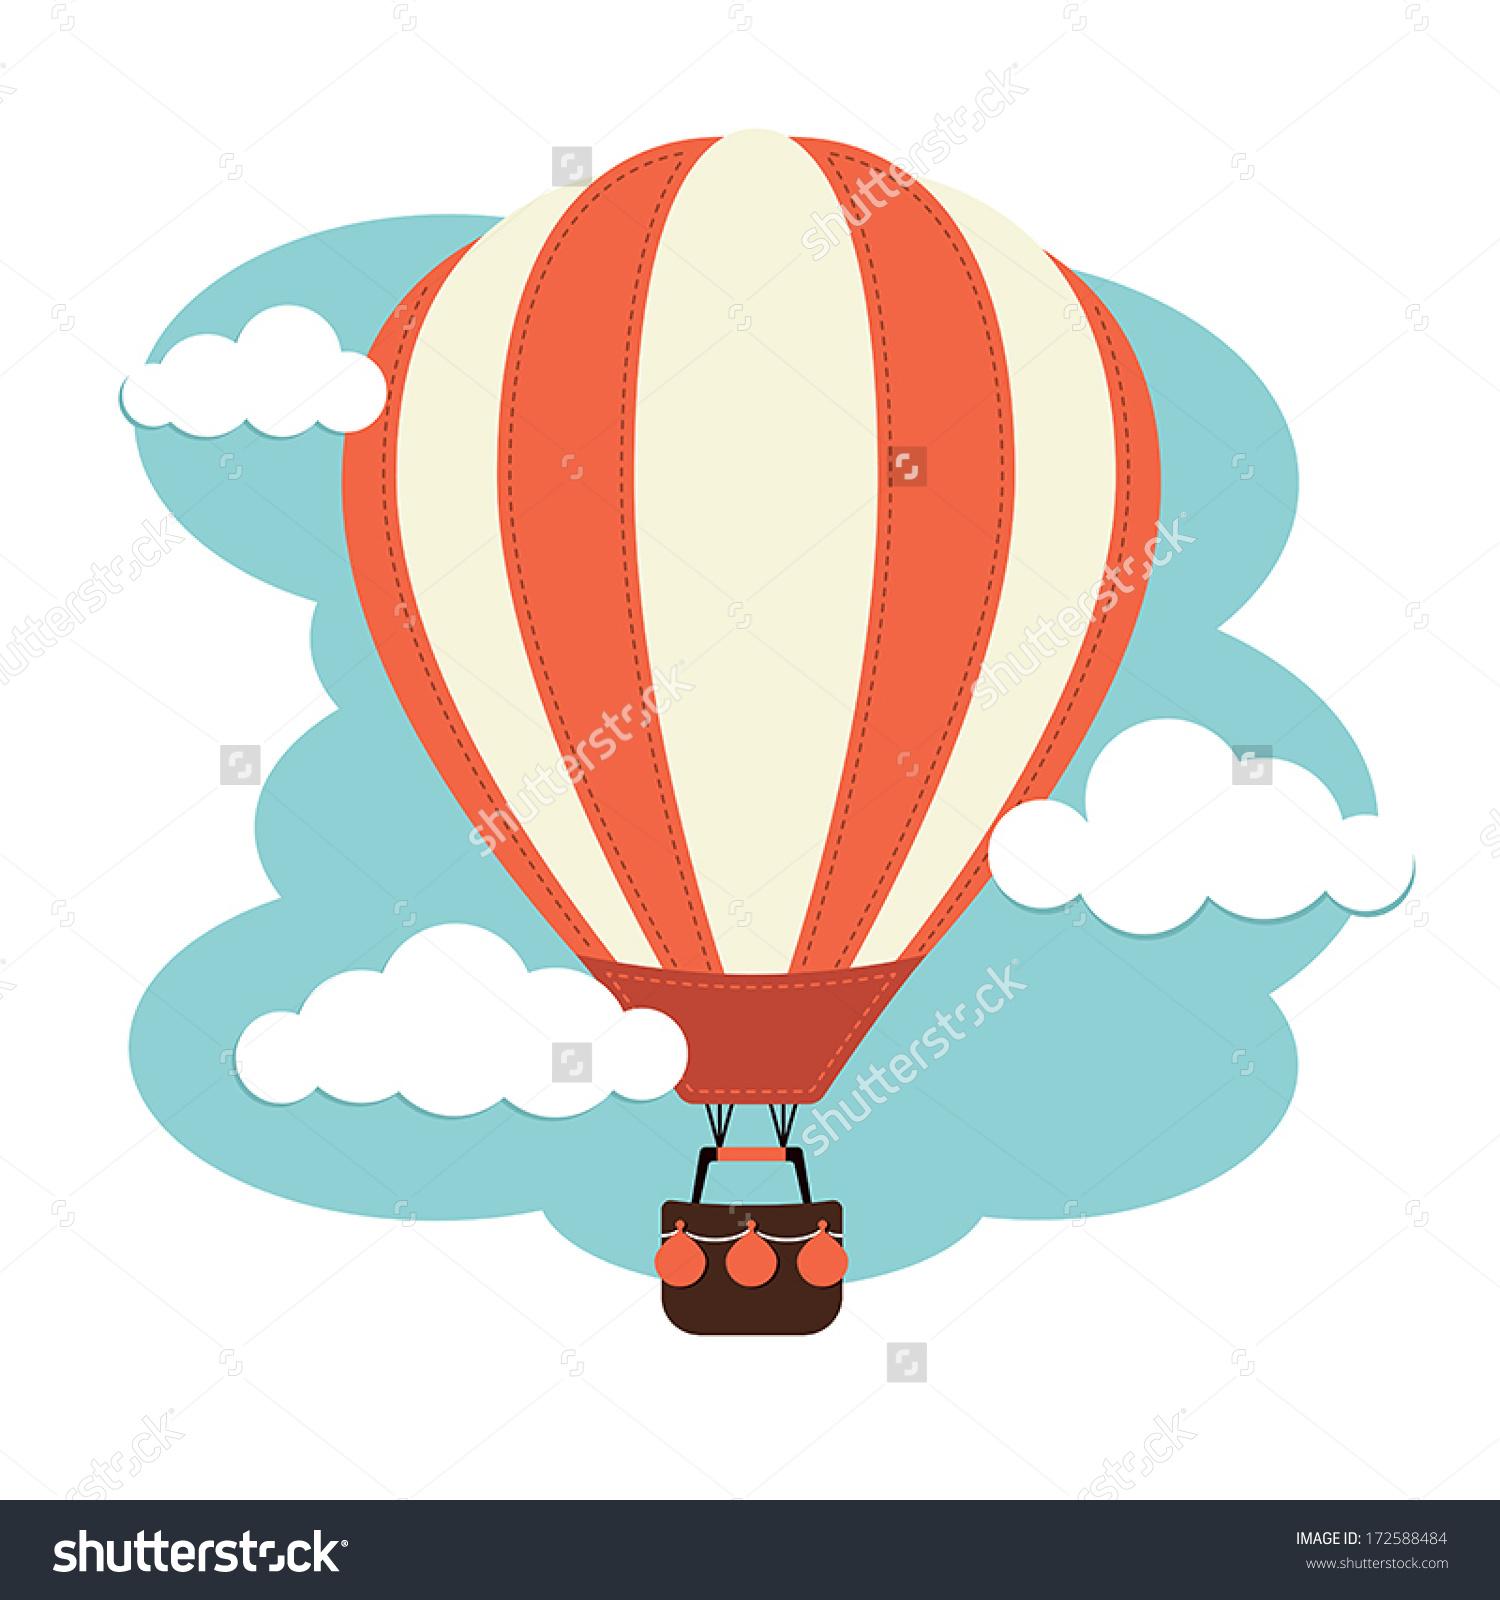 Hot Air Balloon Clouds Stock Vector 172588484.